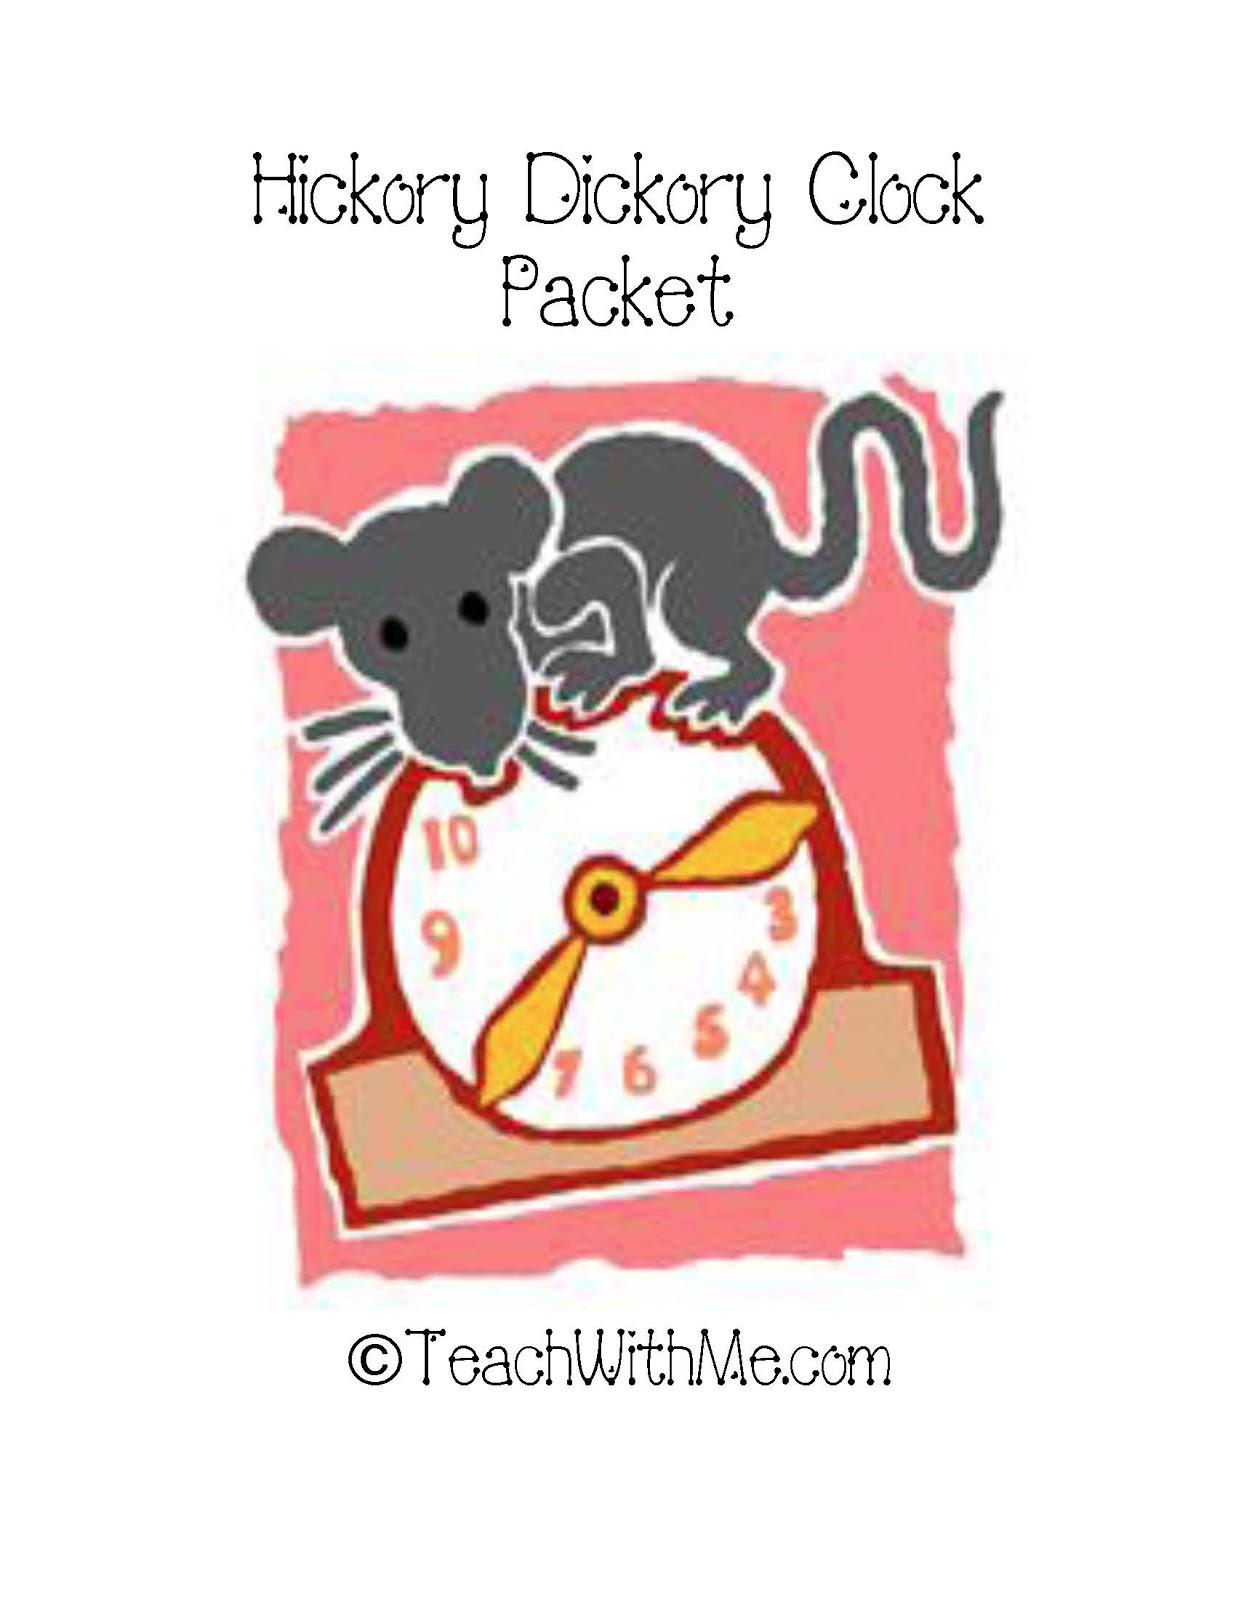 Hickory Dickory Clock Activities